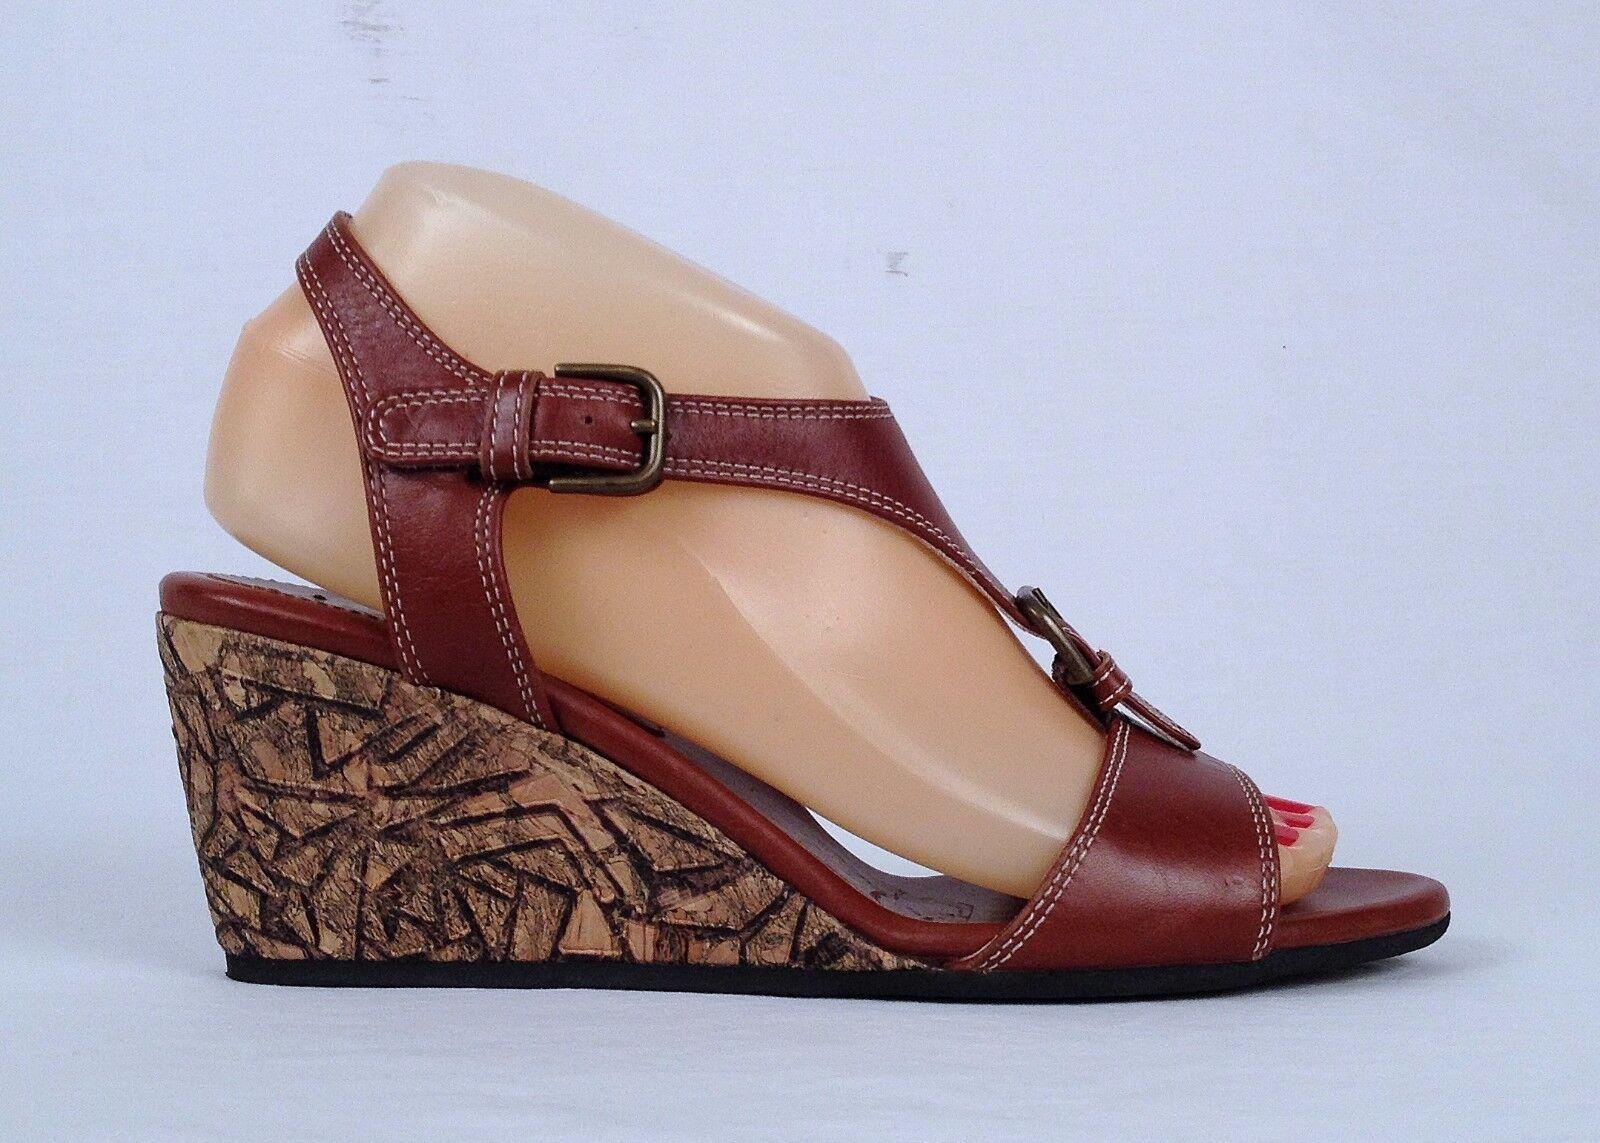 NEU   Anyi Lu 'Lolita' Buckled Wedge Sandale- Choose Größe-  425  (P18)